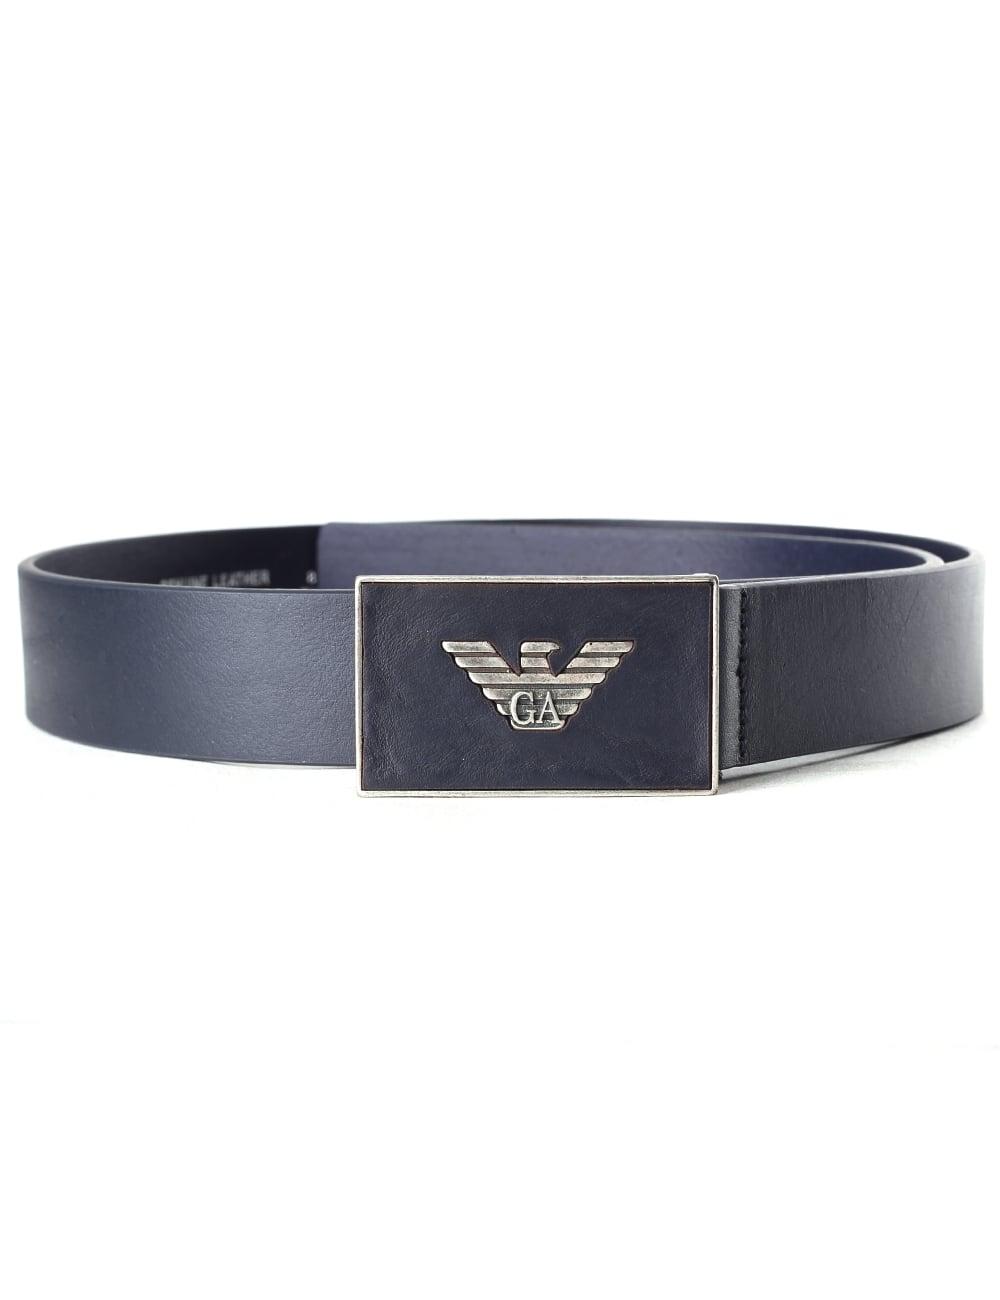 6ccdc10978 Emporio Armani Men's Eagle Buckle Belt